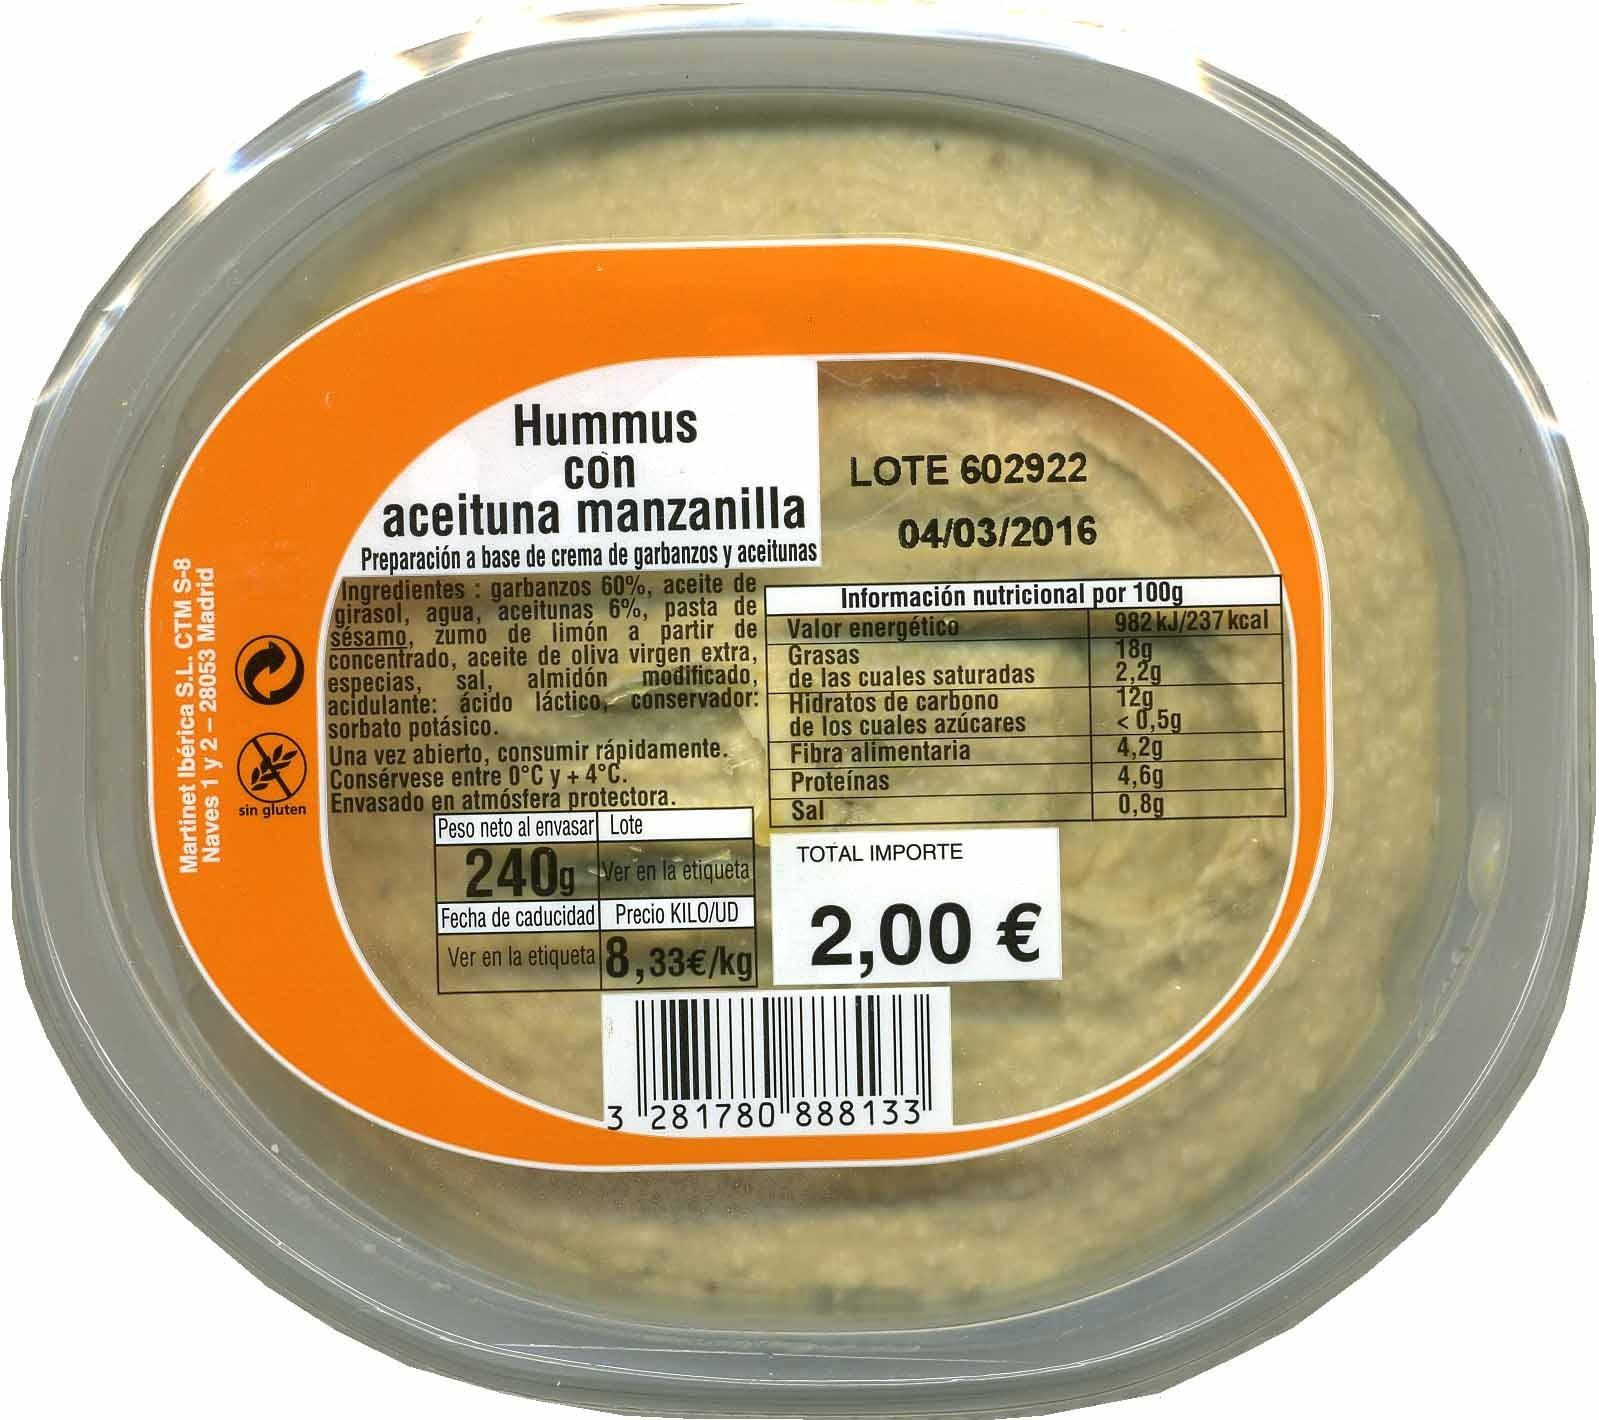 Hummus con aceituna manzanilla - Producte